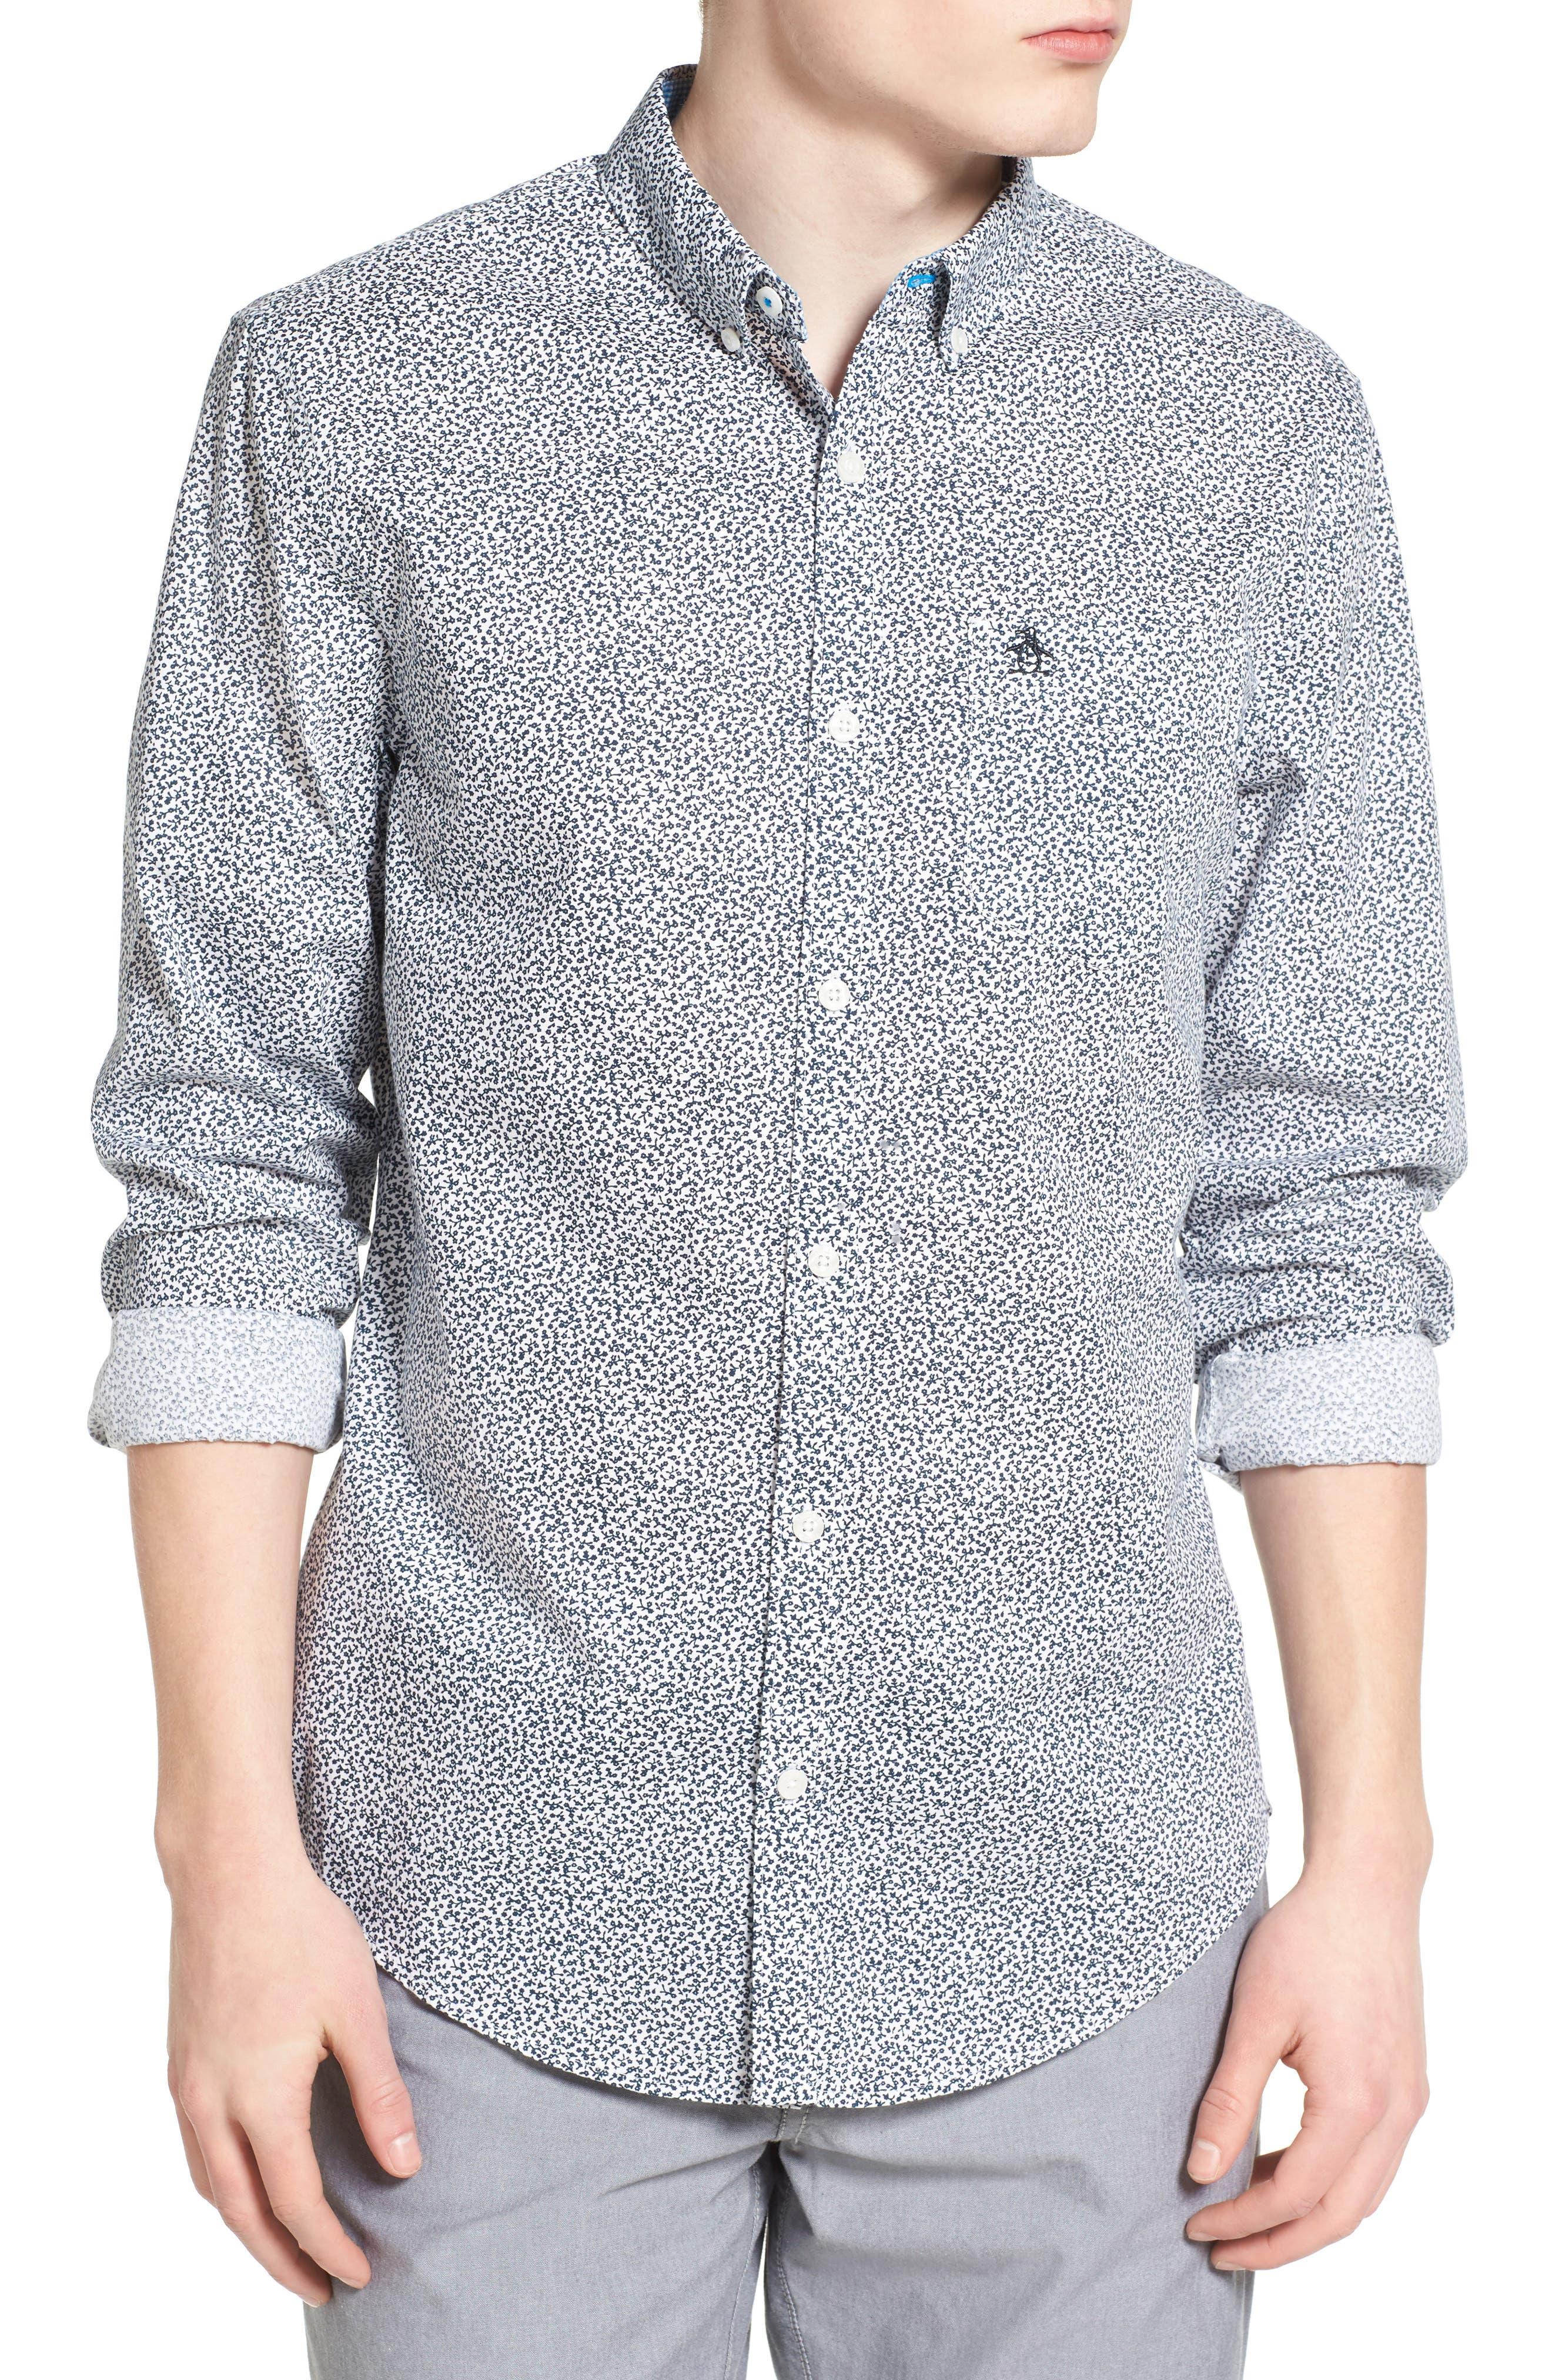 ORIGINAL PENGUIN Floral Print Woven Shirt